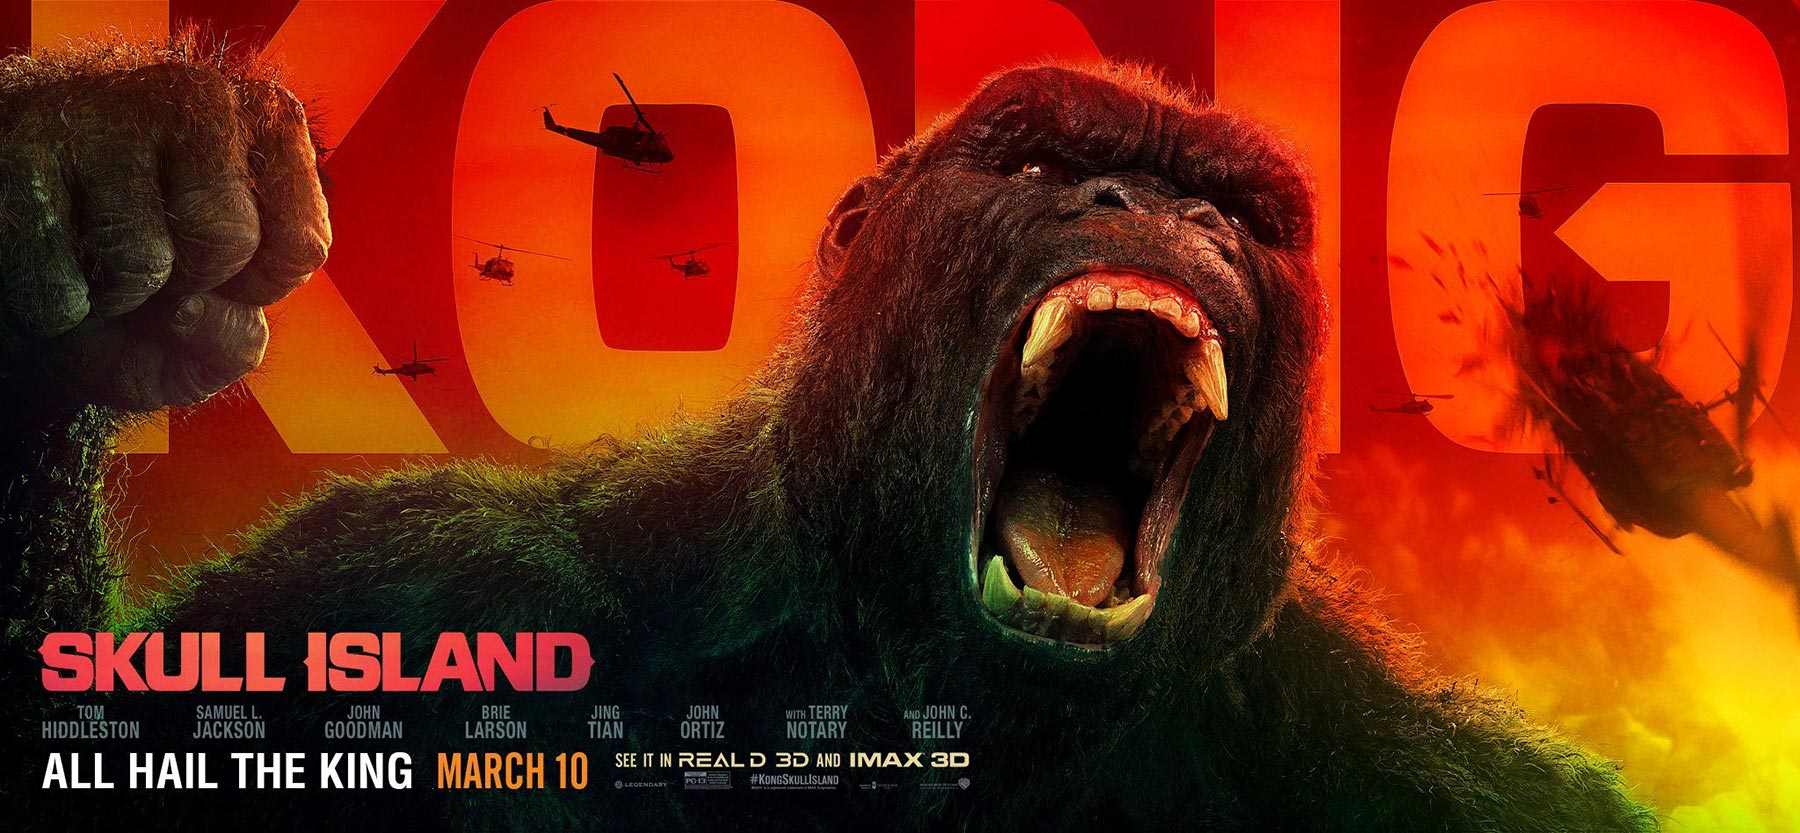 Kong: Skull Island Poster #4